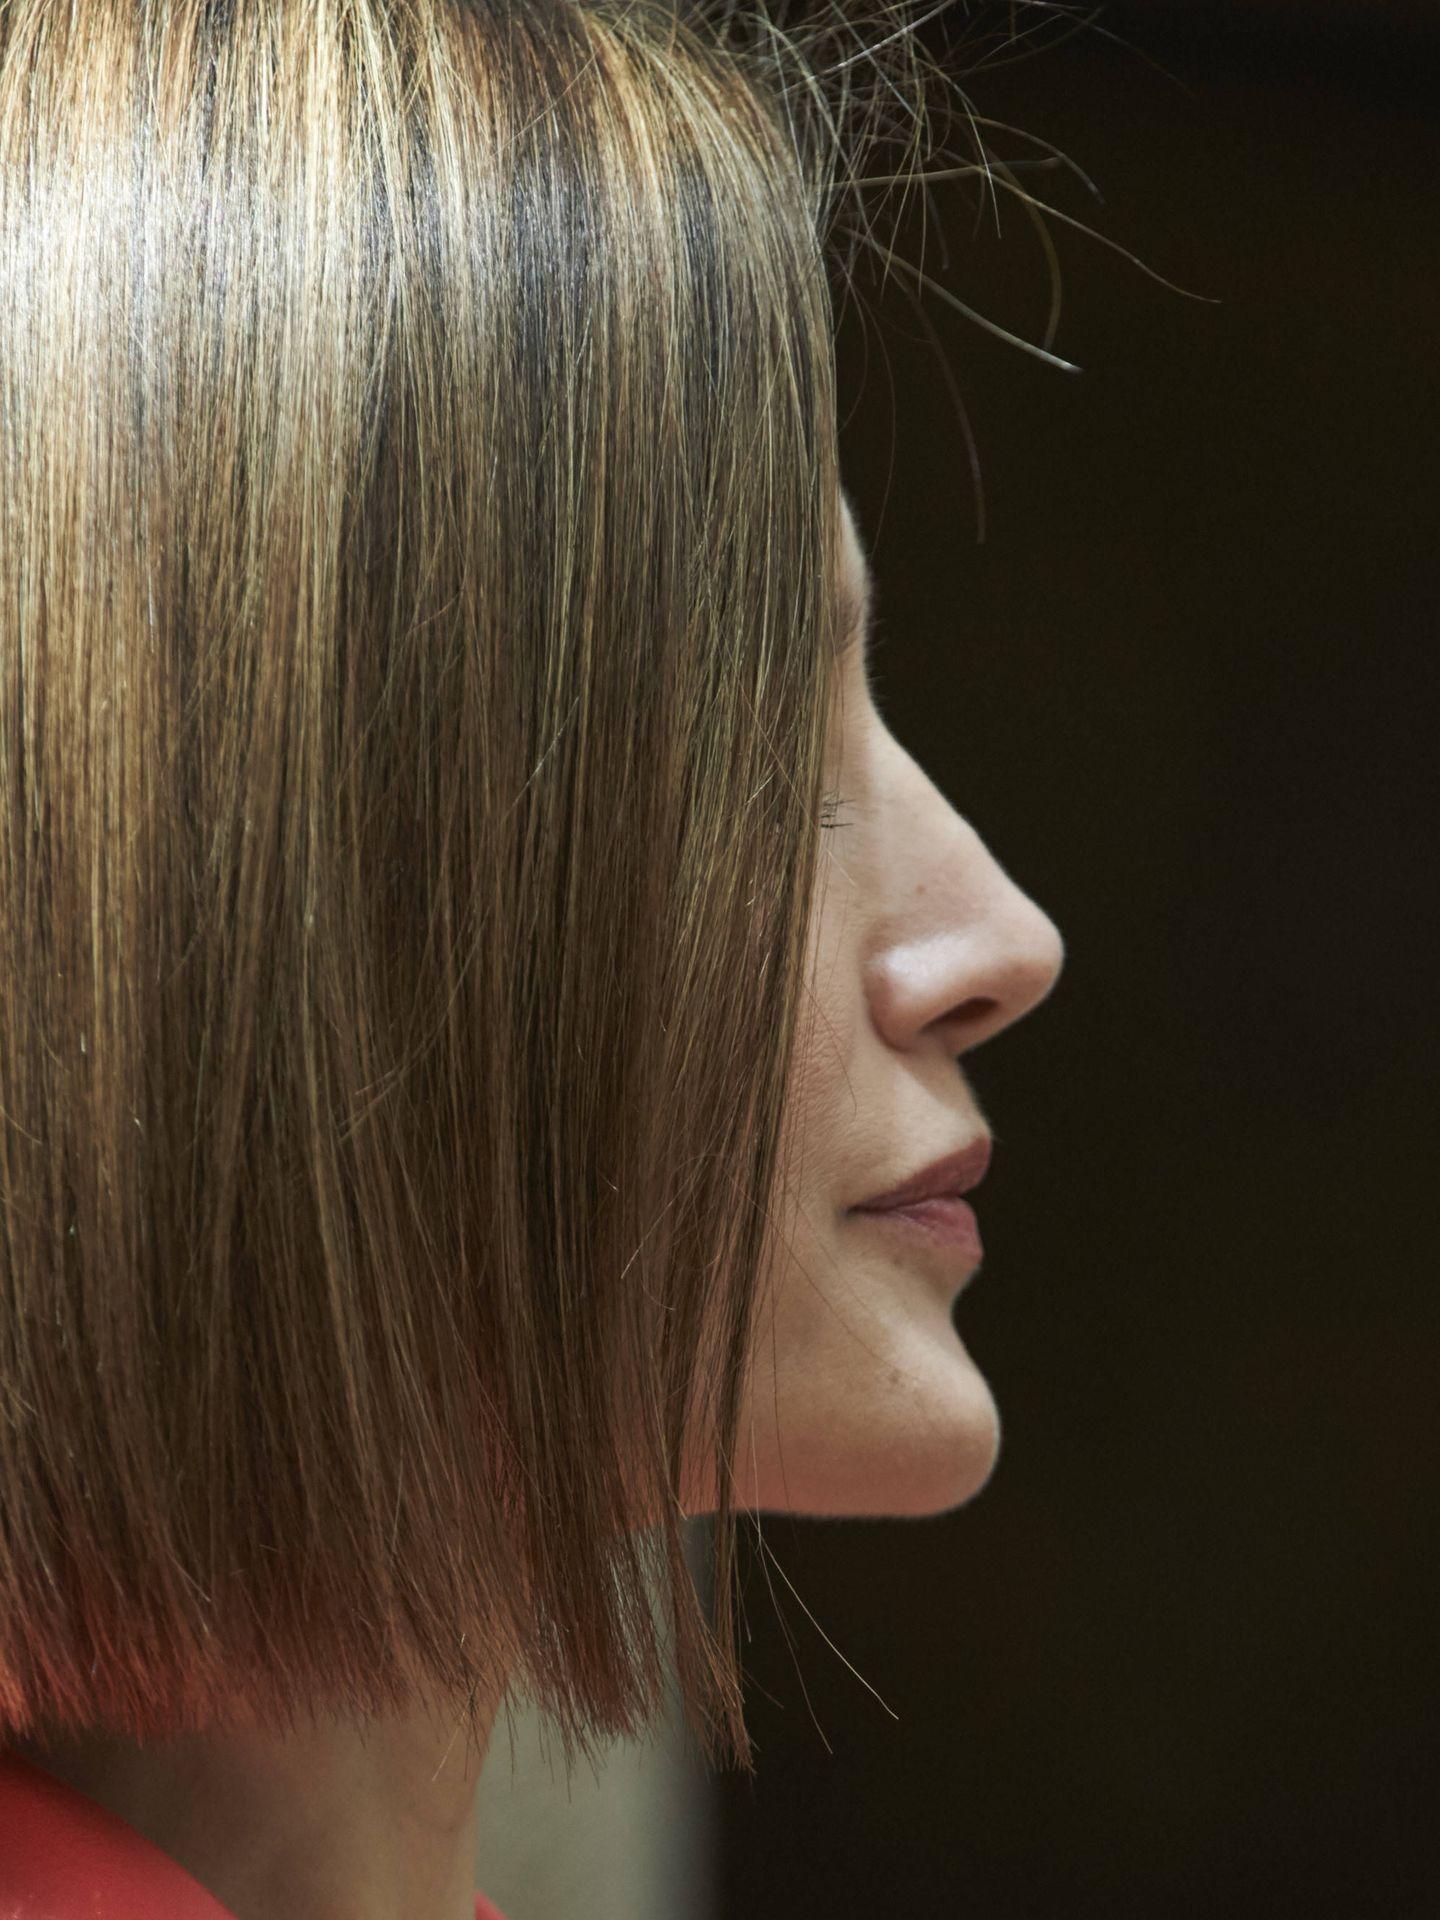 Detalle del corte de pelo de Letizia de perfil. (Getty)